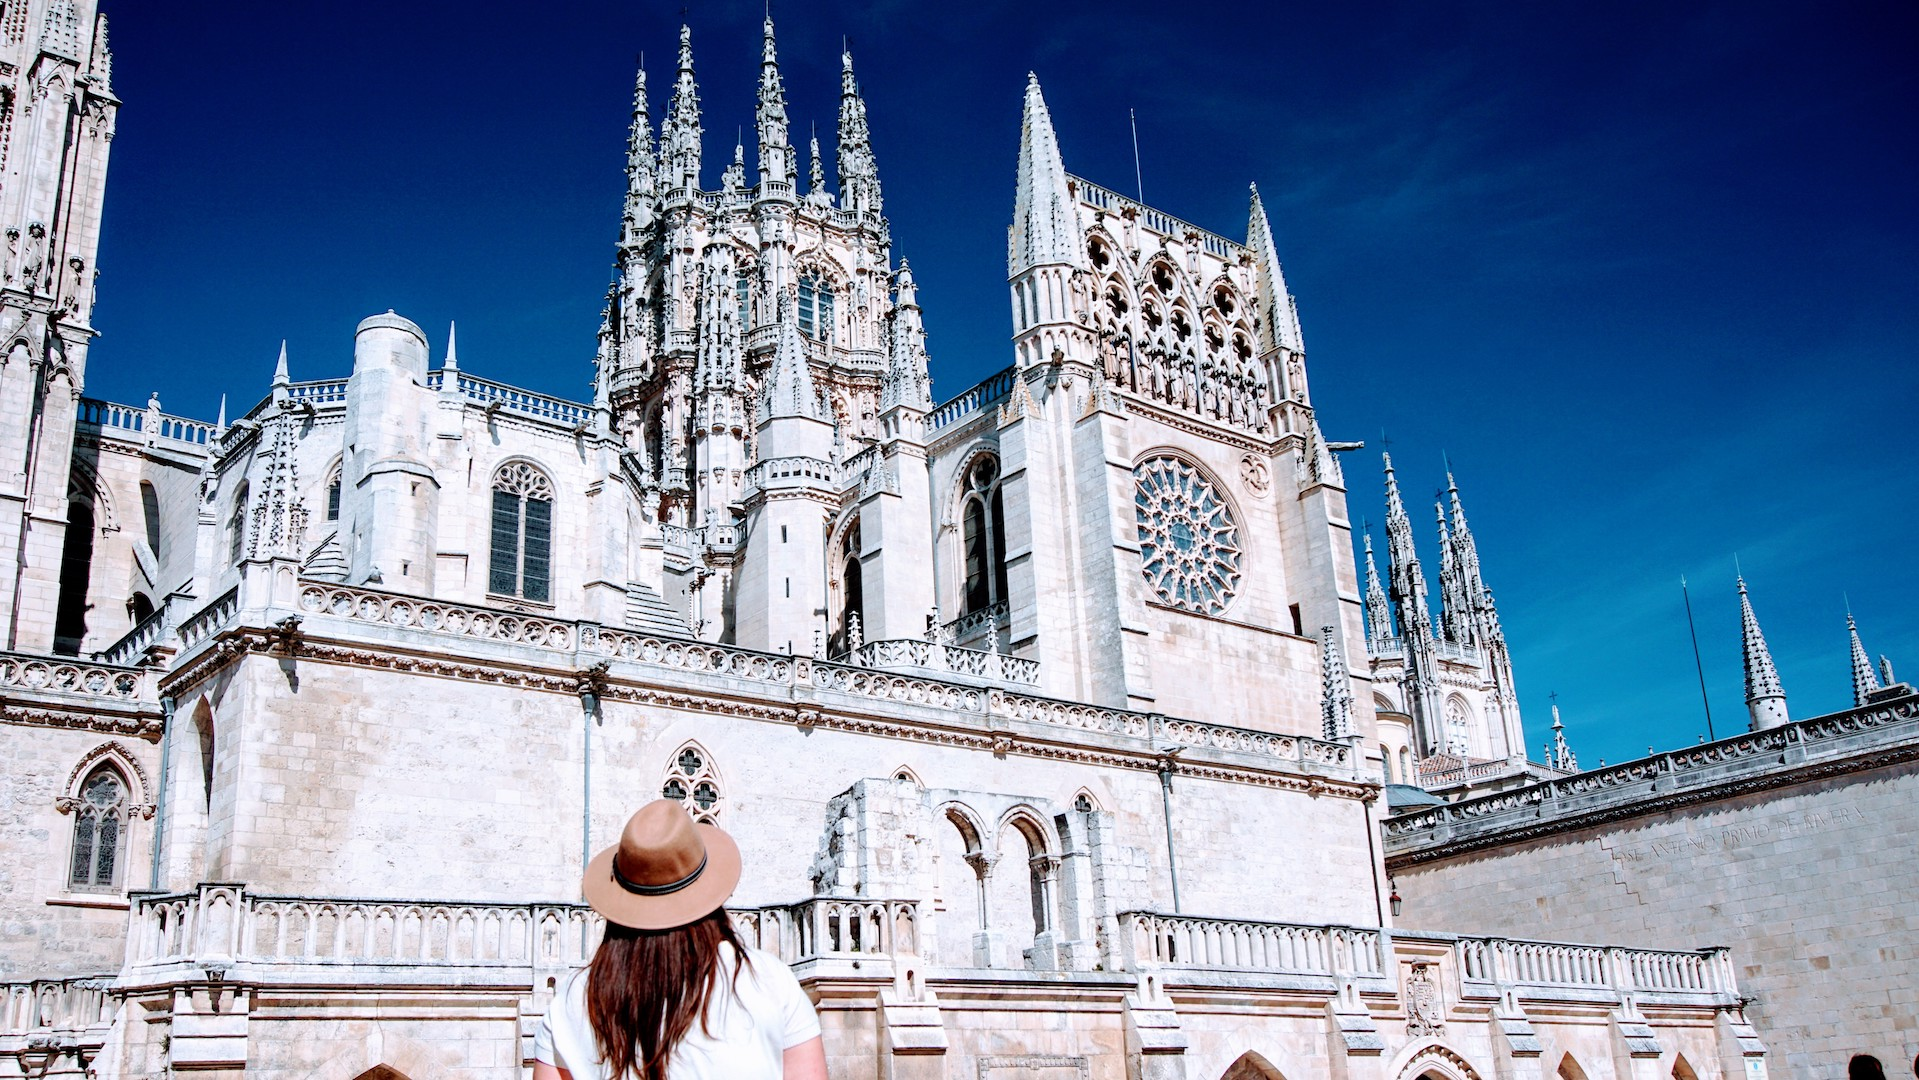 Vista da Plaza Del Rey para a Catedral de Burgos